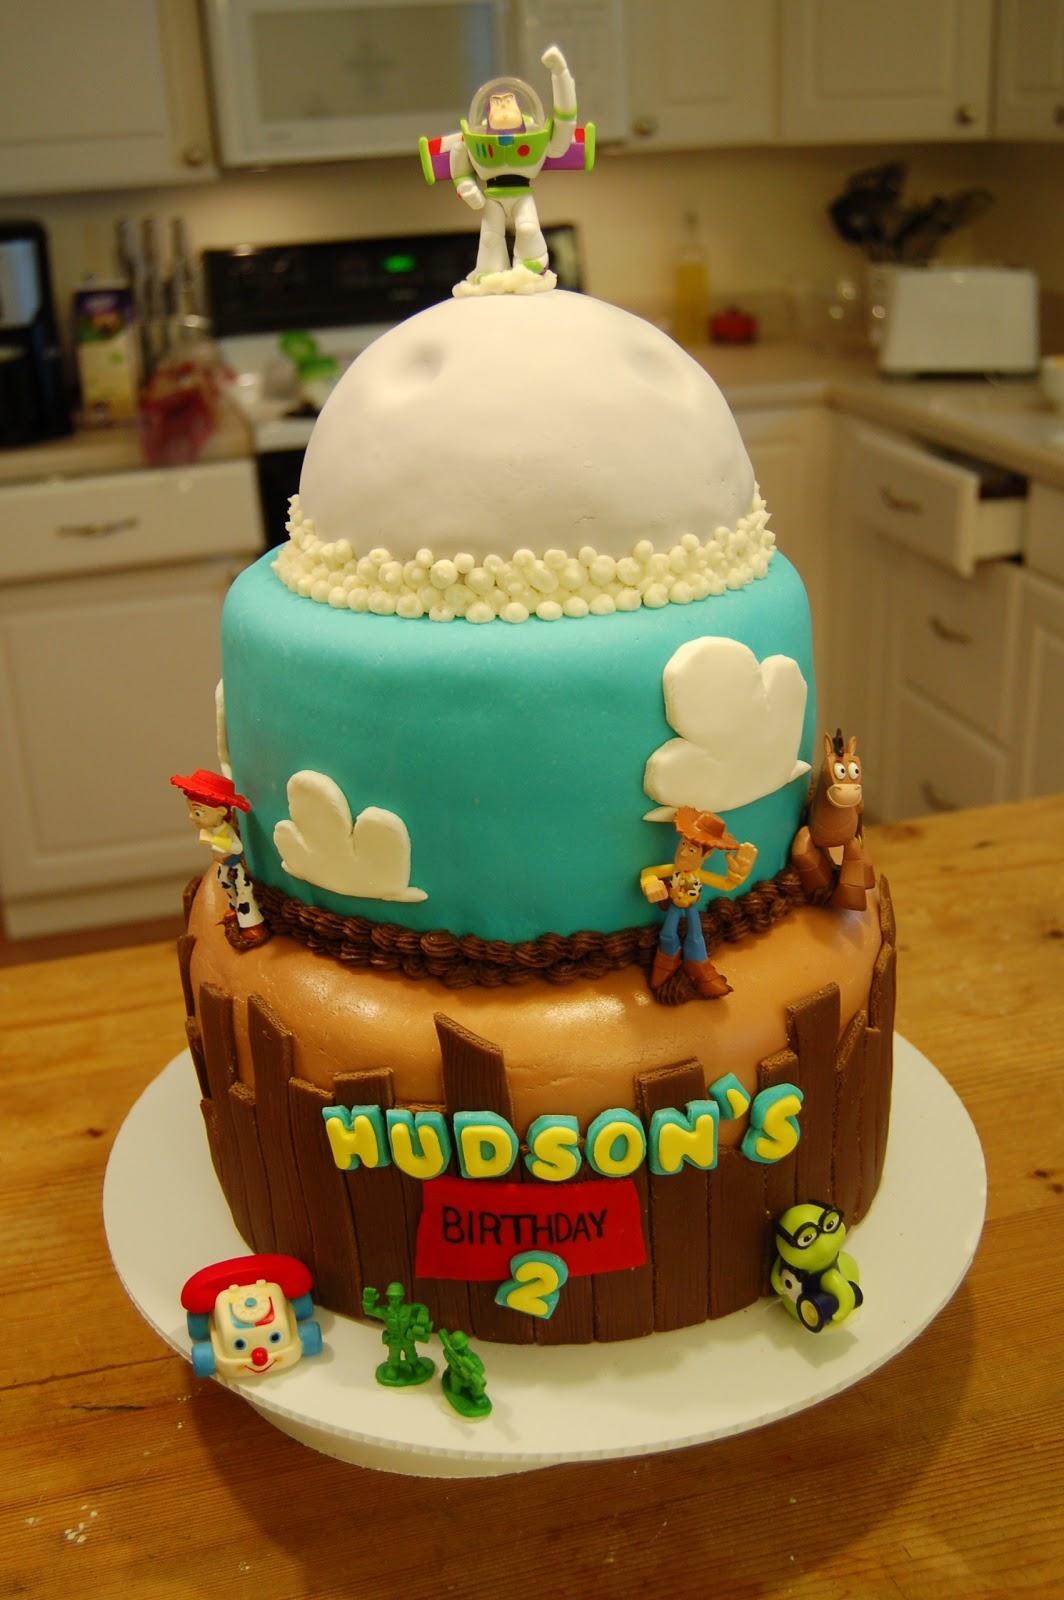 c u0026 39 est si bon sweets  toy story birthday cake